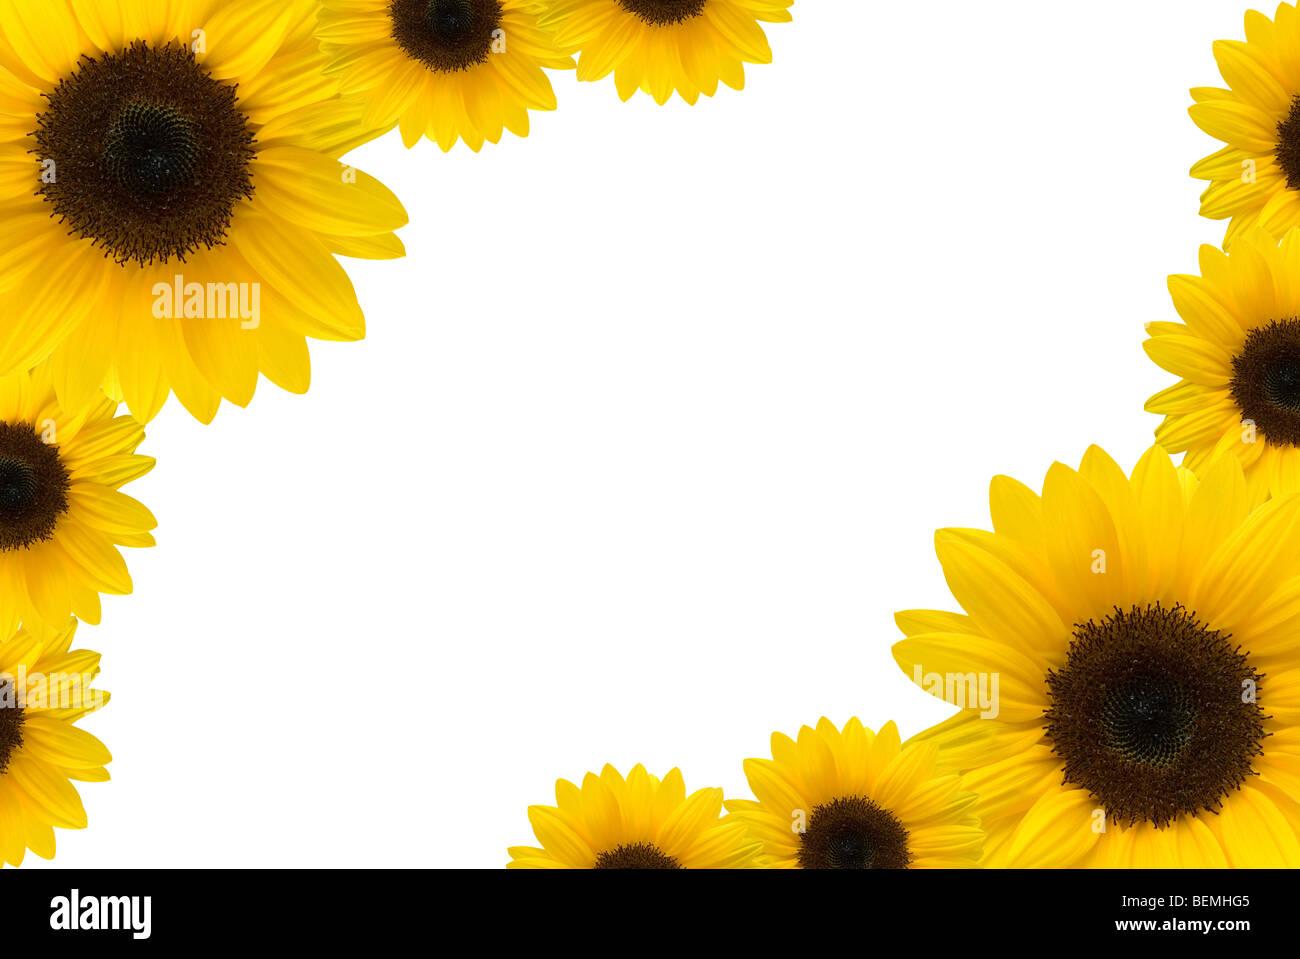 Sunflower frame Stock Photo: 26268373 - Alamy